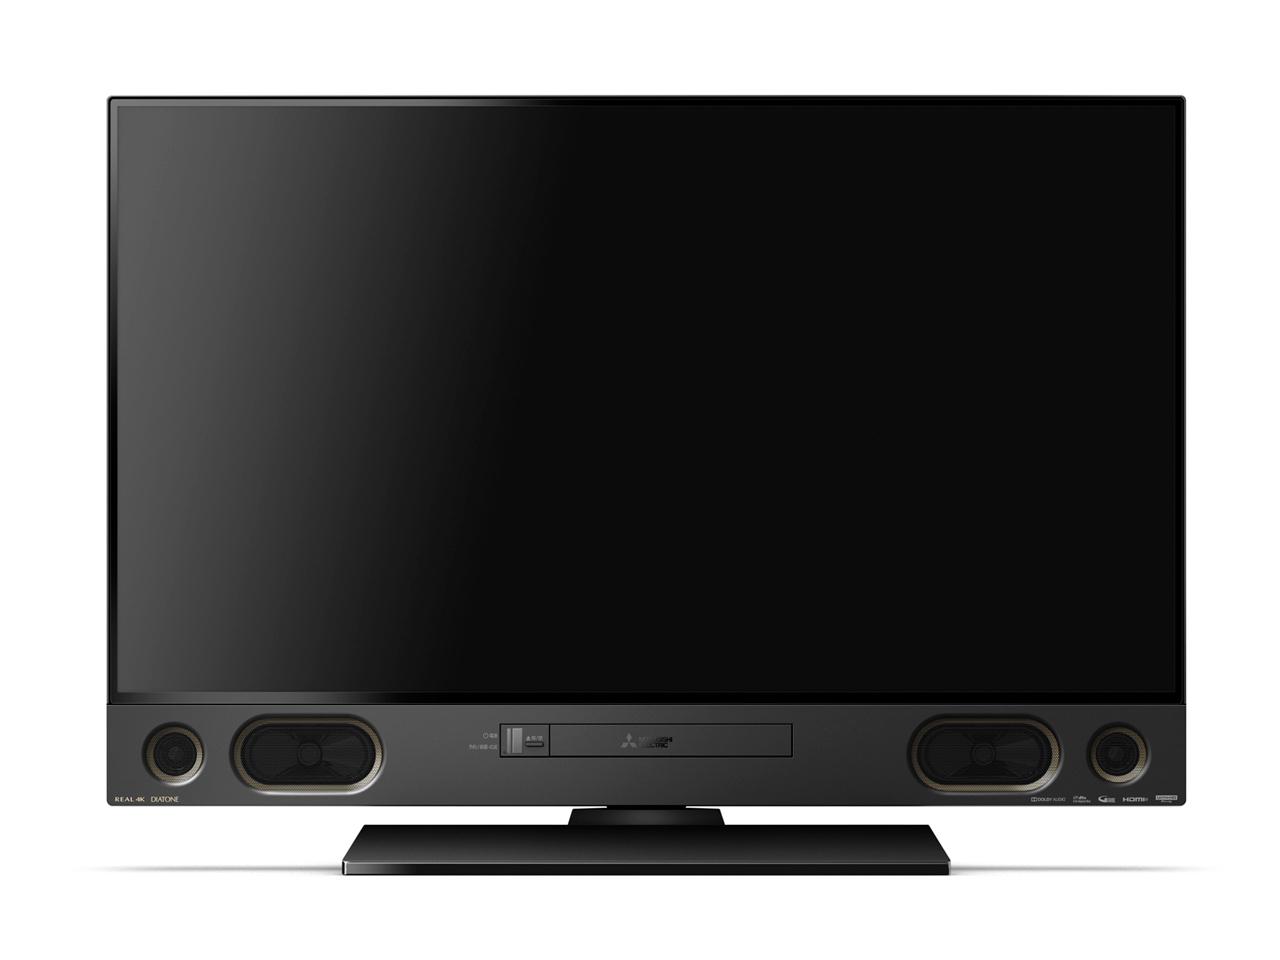 REAL LCD-A40RA1000 [40インチ] の製品画像